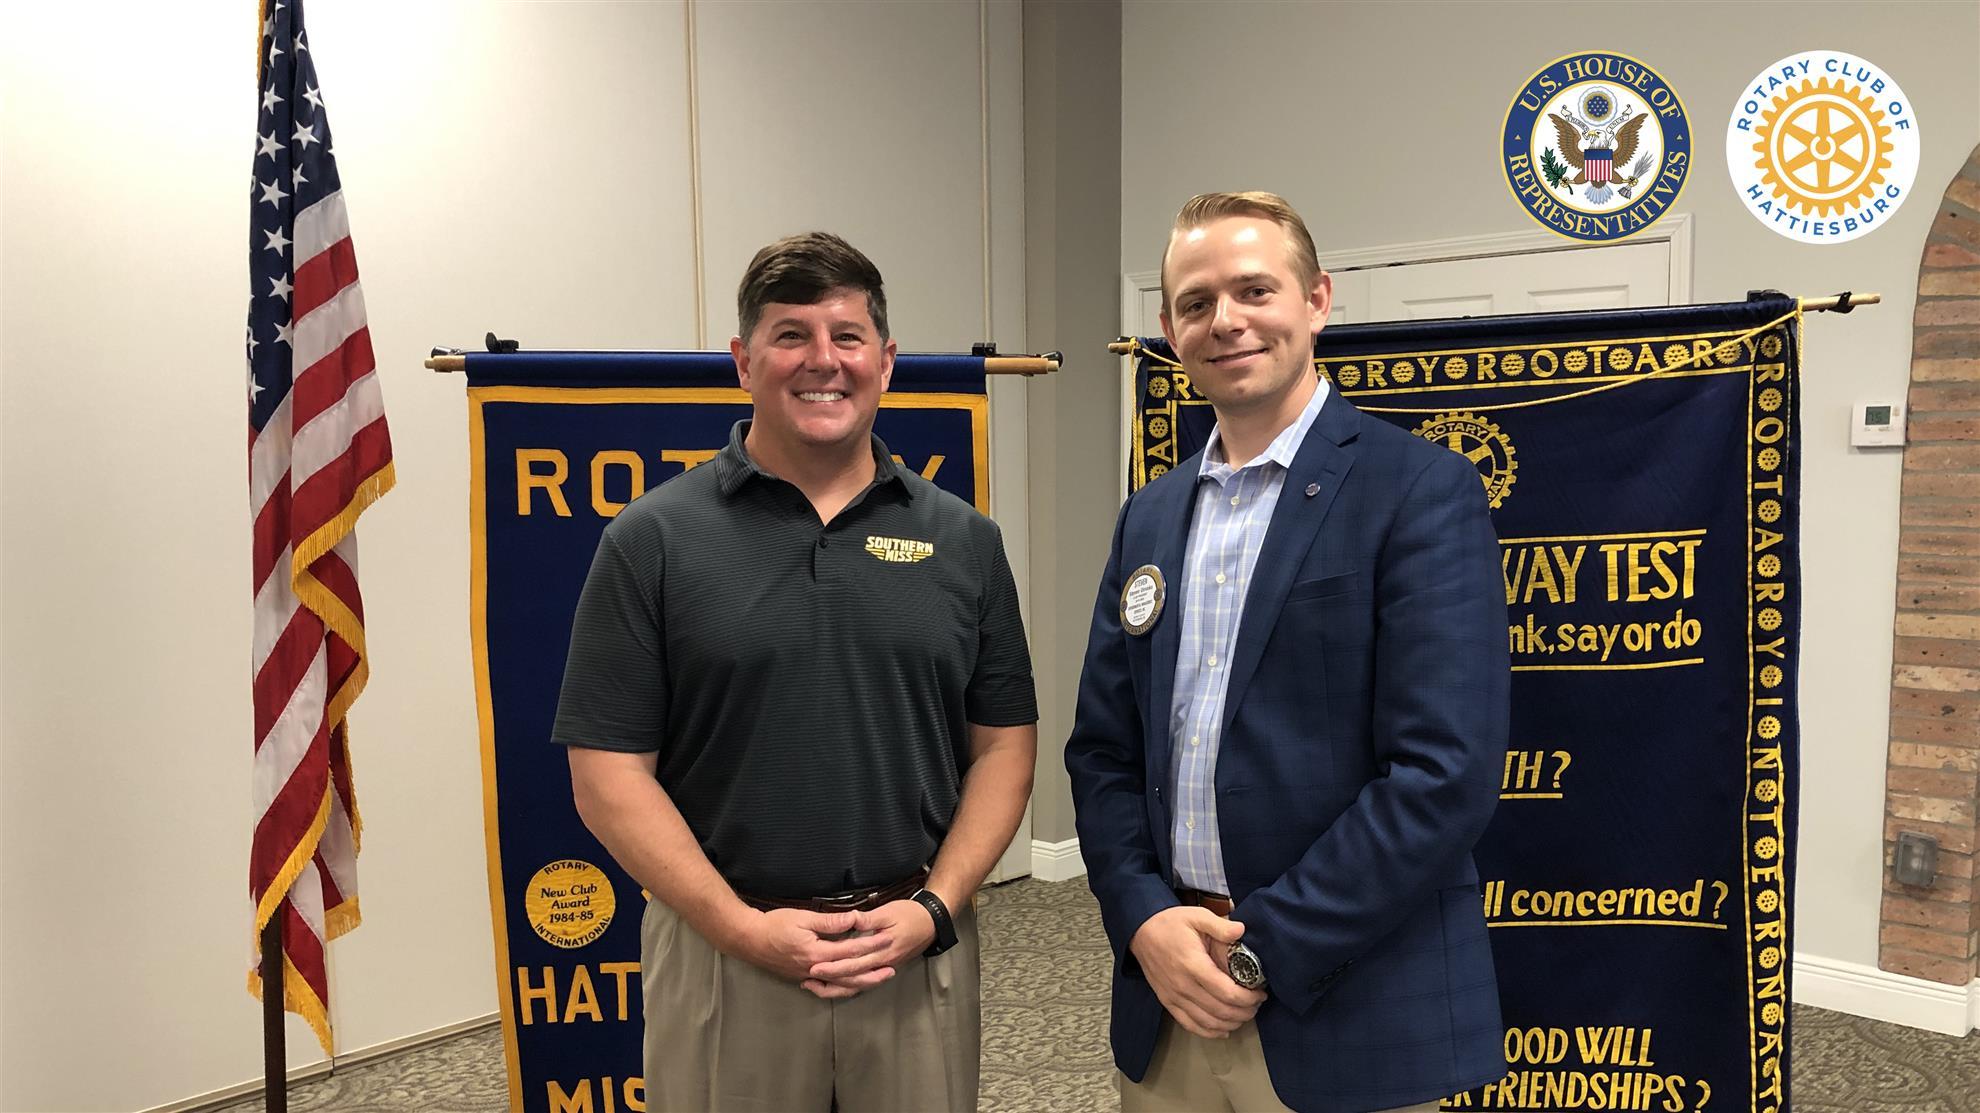 Stories | Rotary Club of Hattiesburg